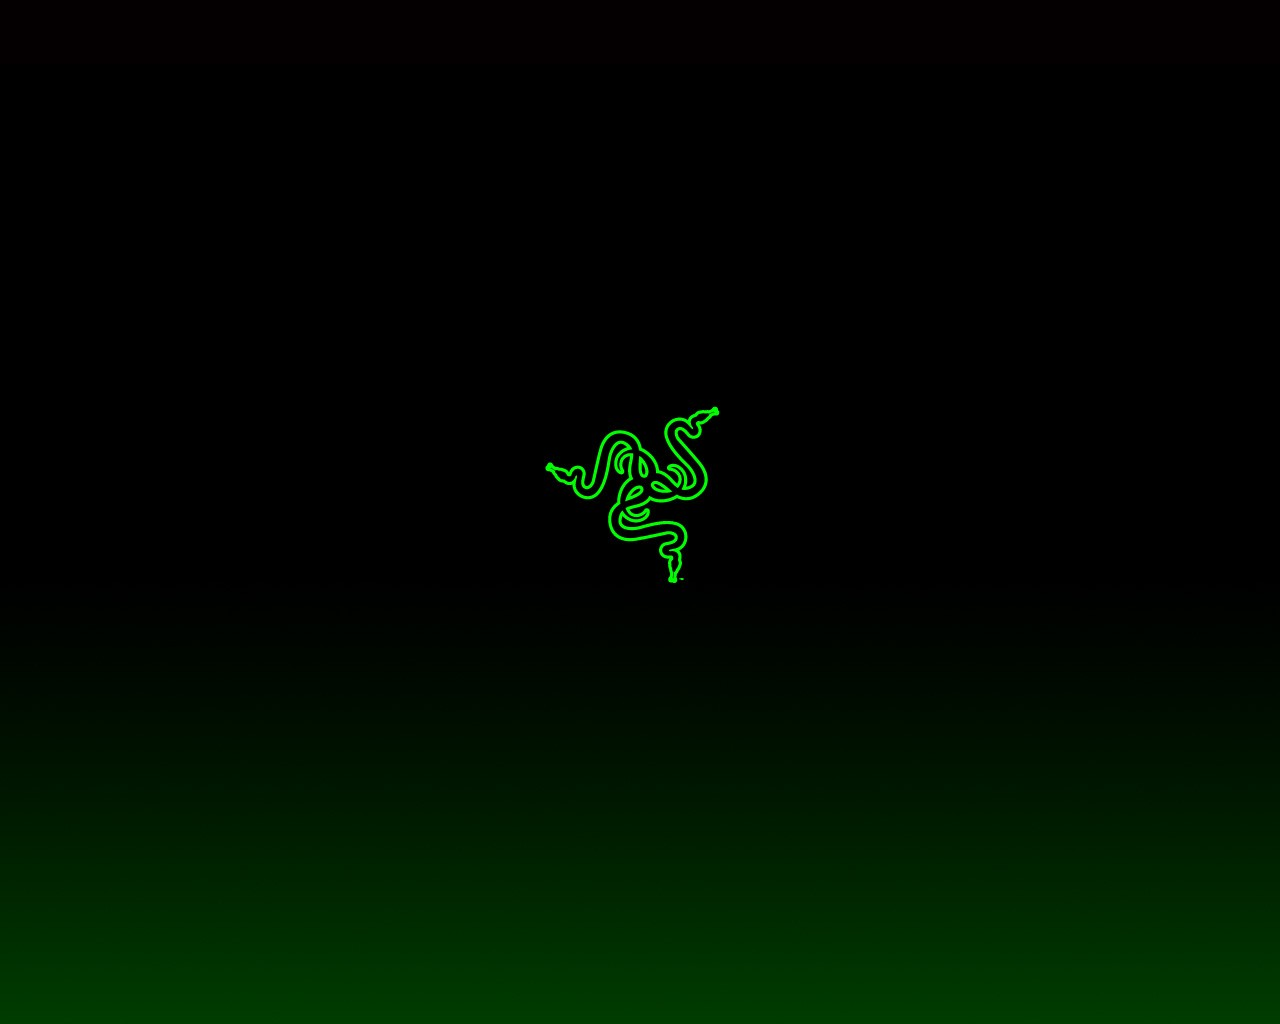 General 1280x1024 Razer logo simple background